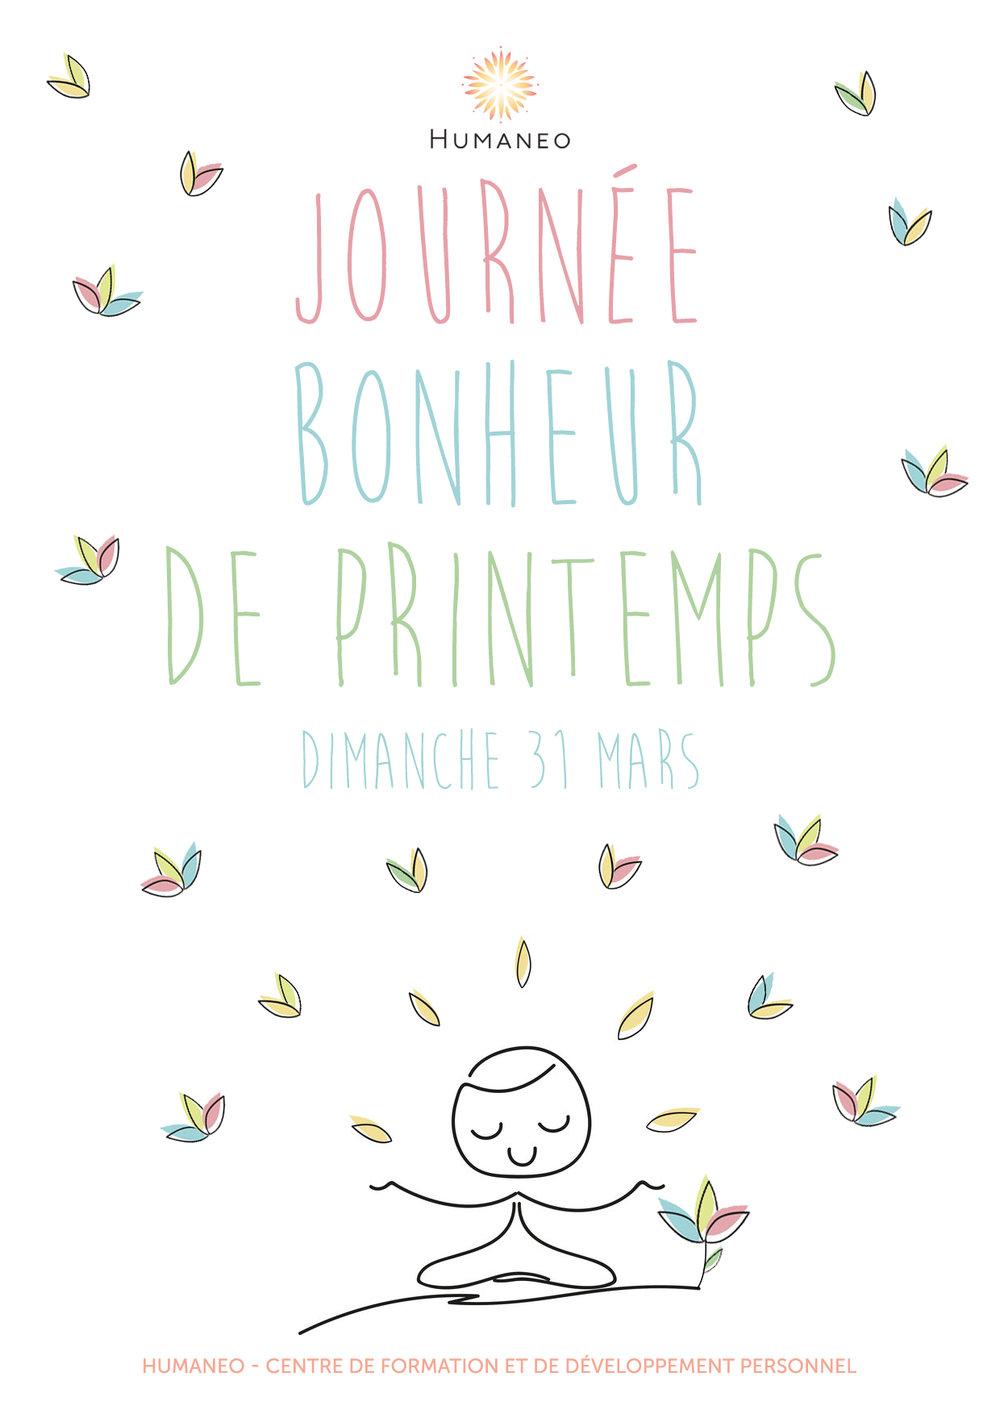 Flyer Humaneo J Bonheur Mars 2019 recto_2.jpg